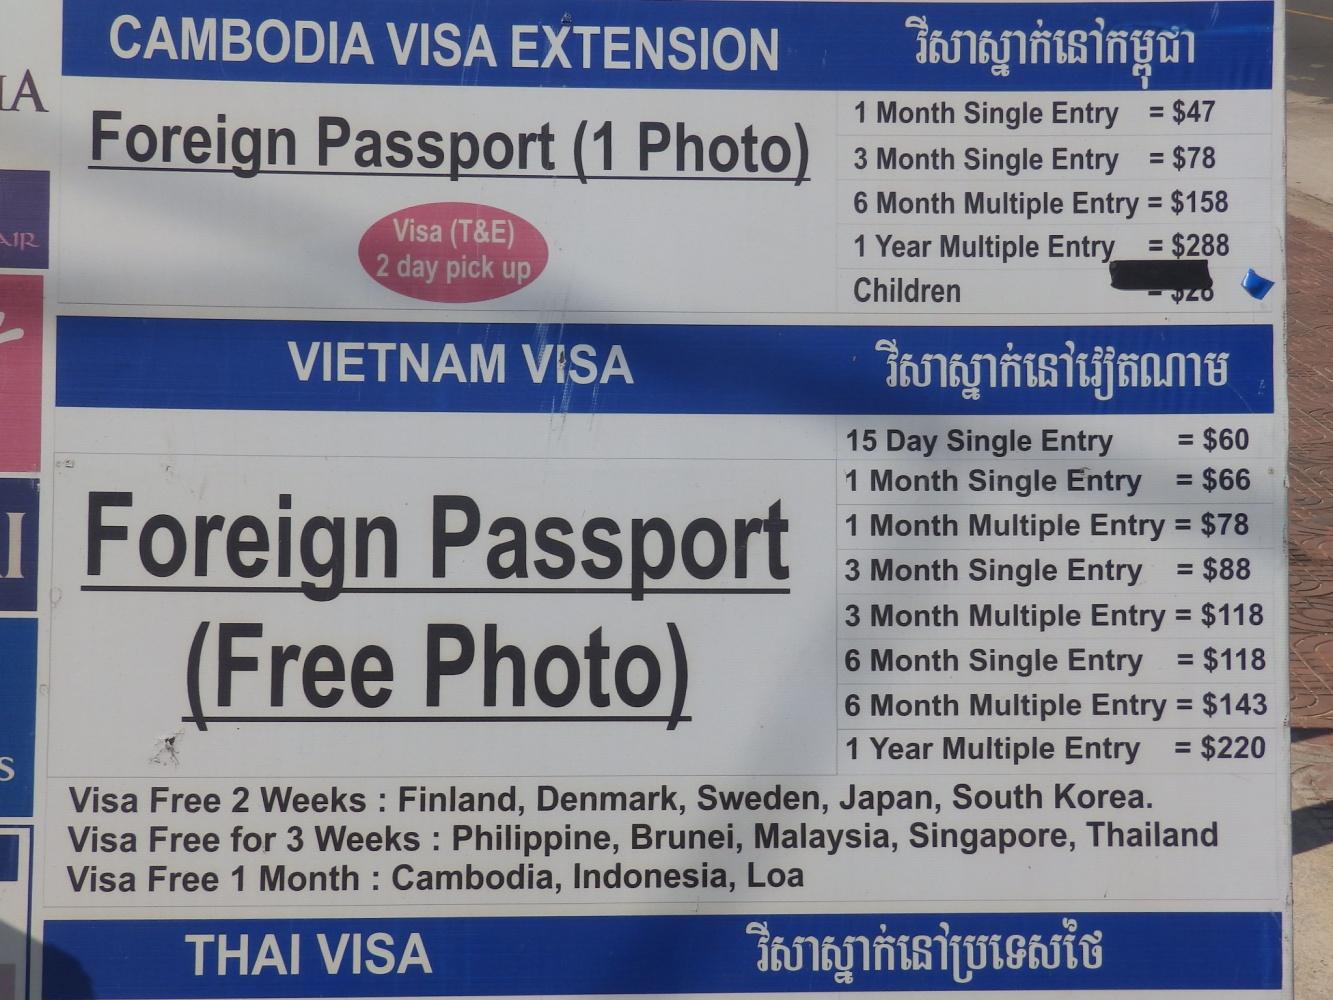 Cambodia e visa photo